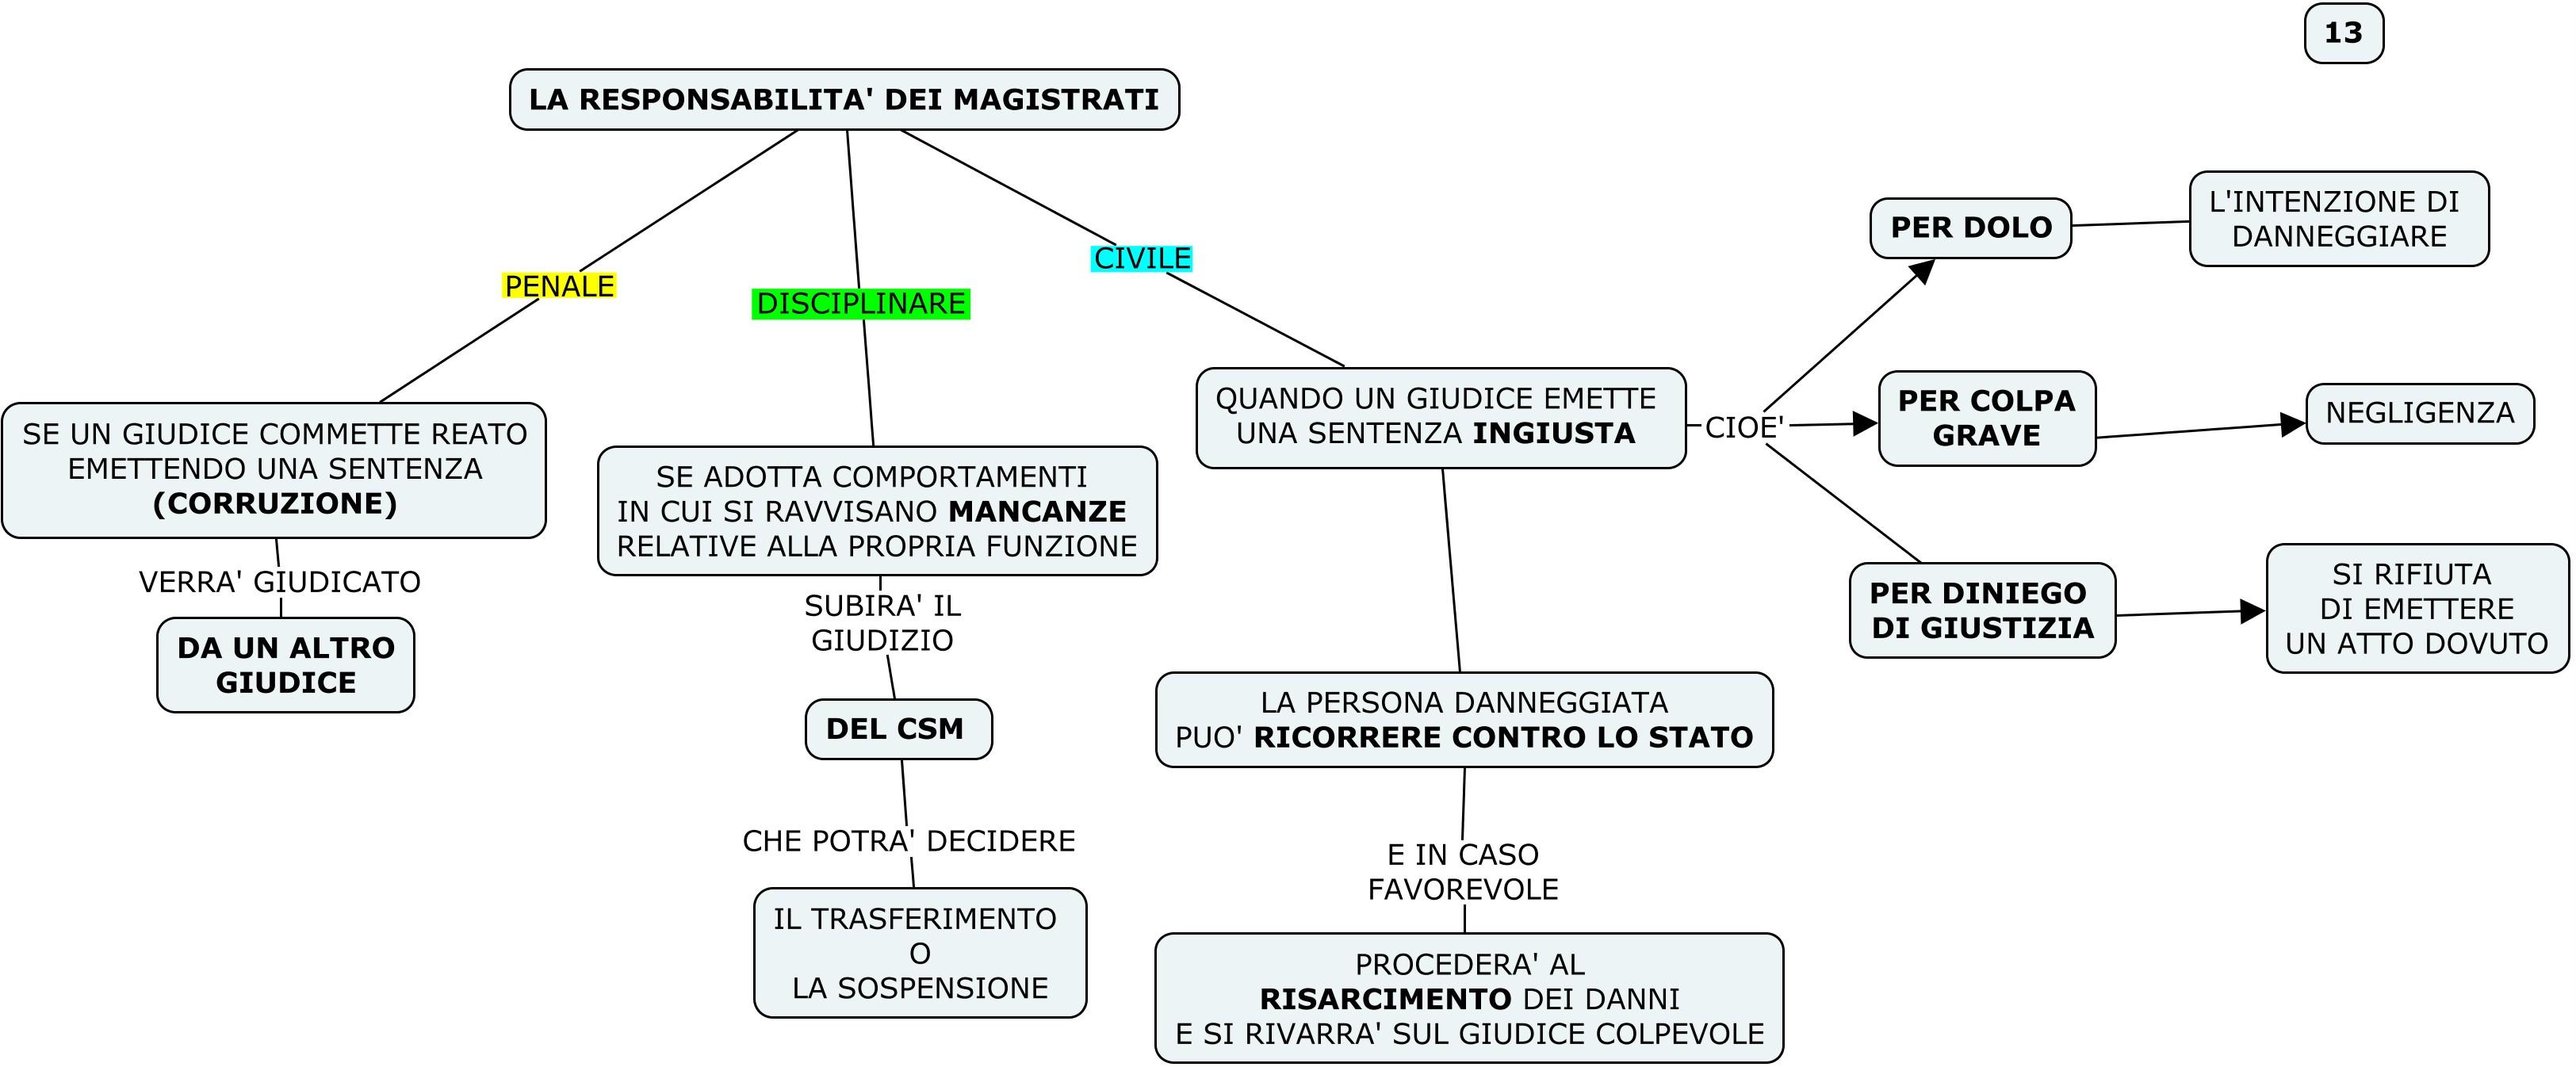 MAPPA 13